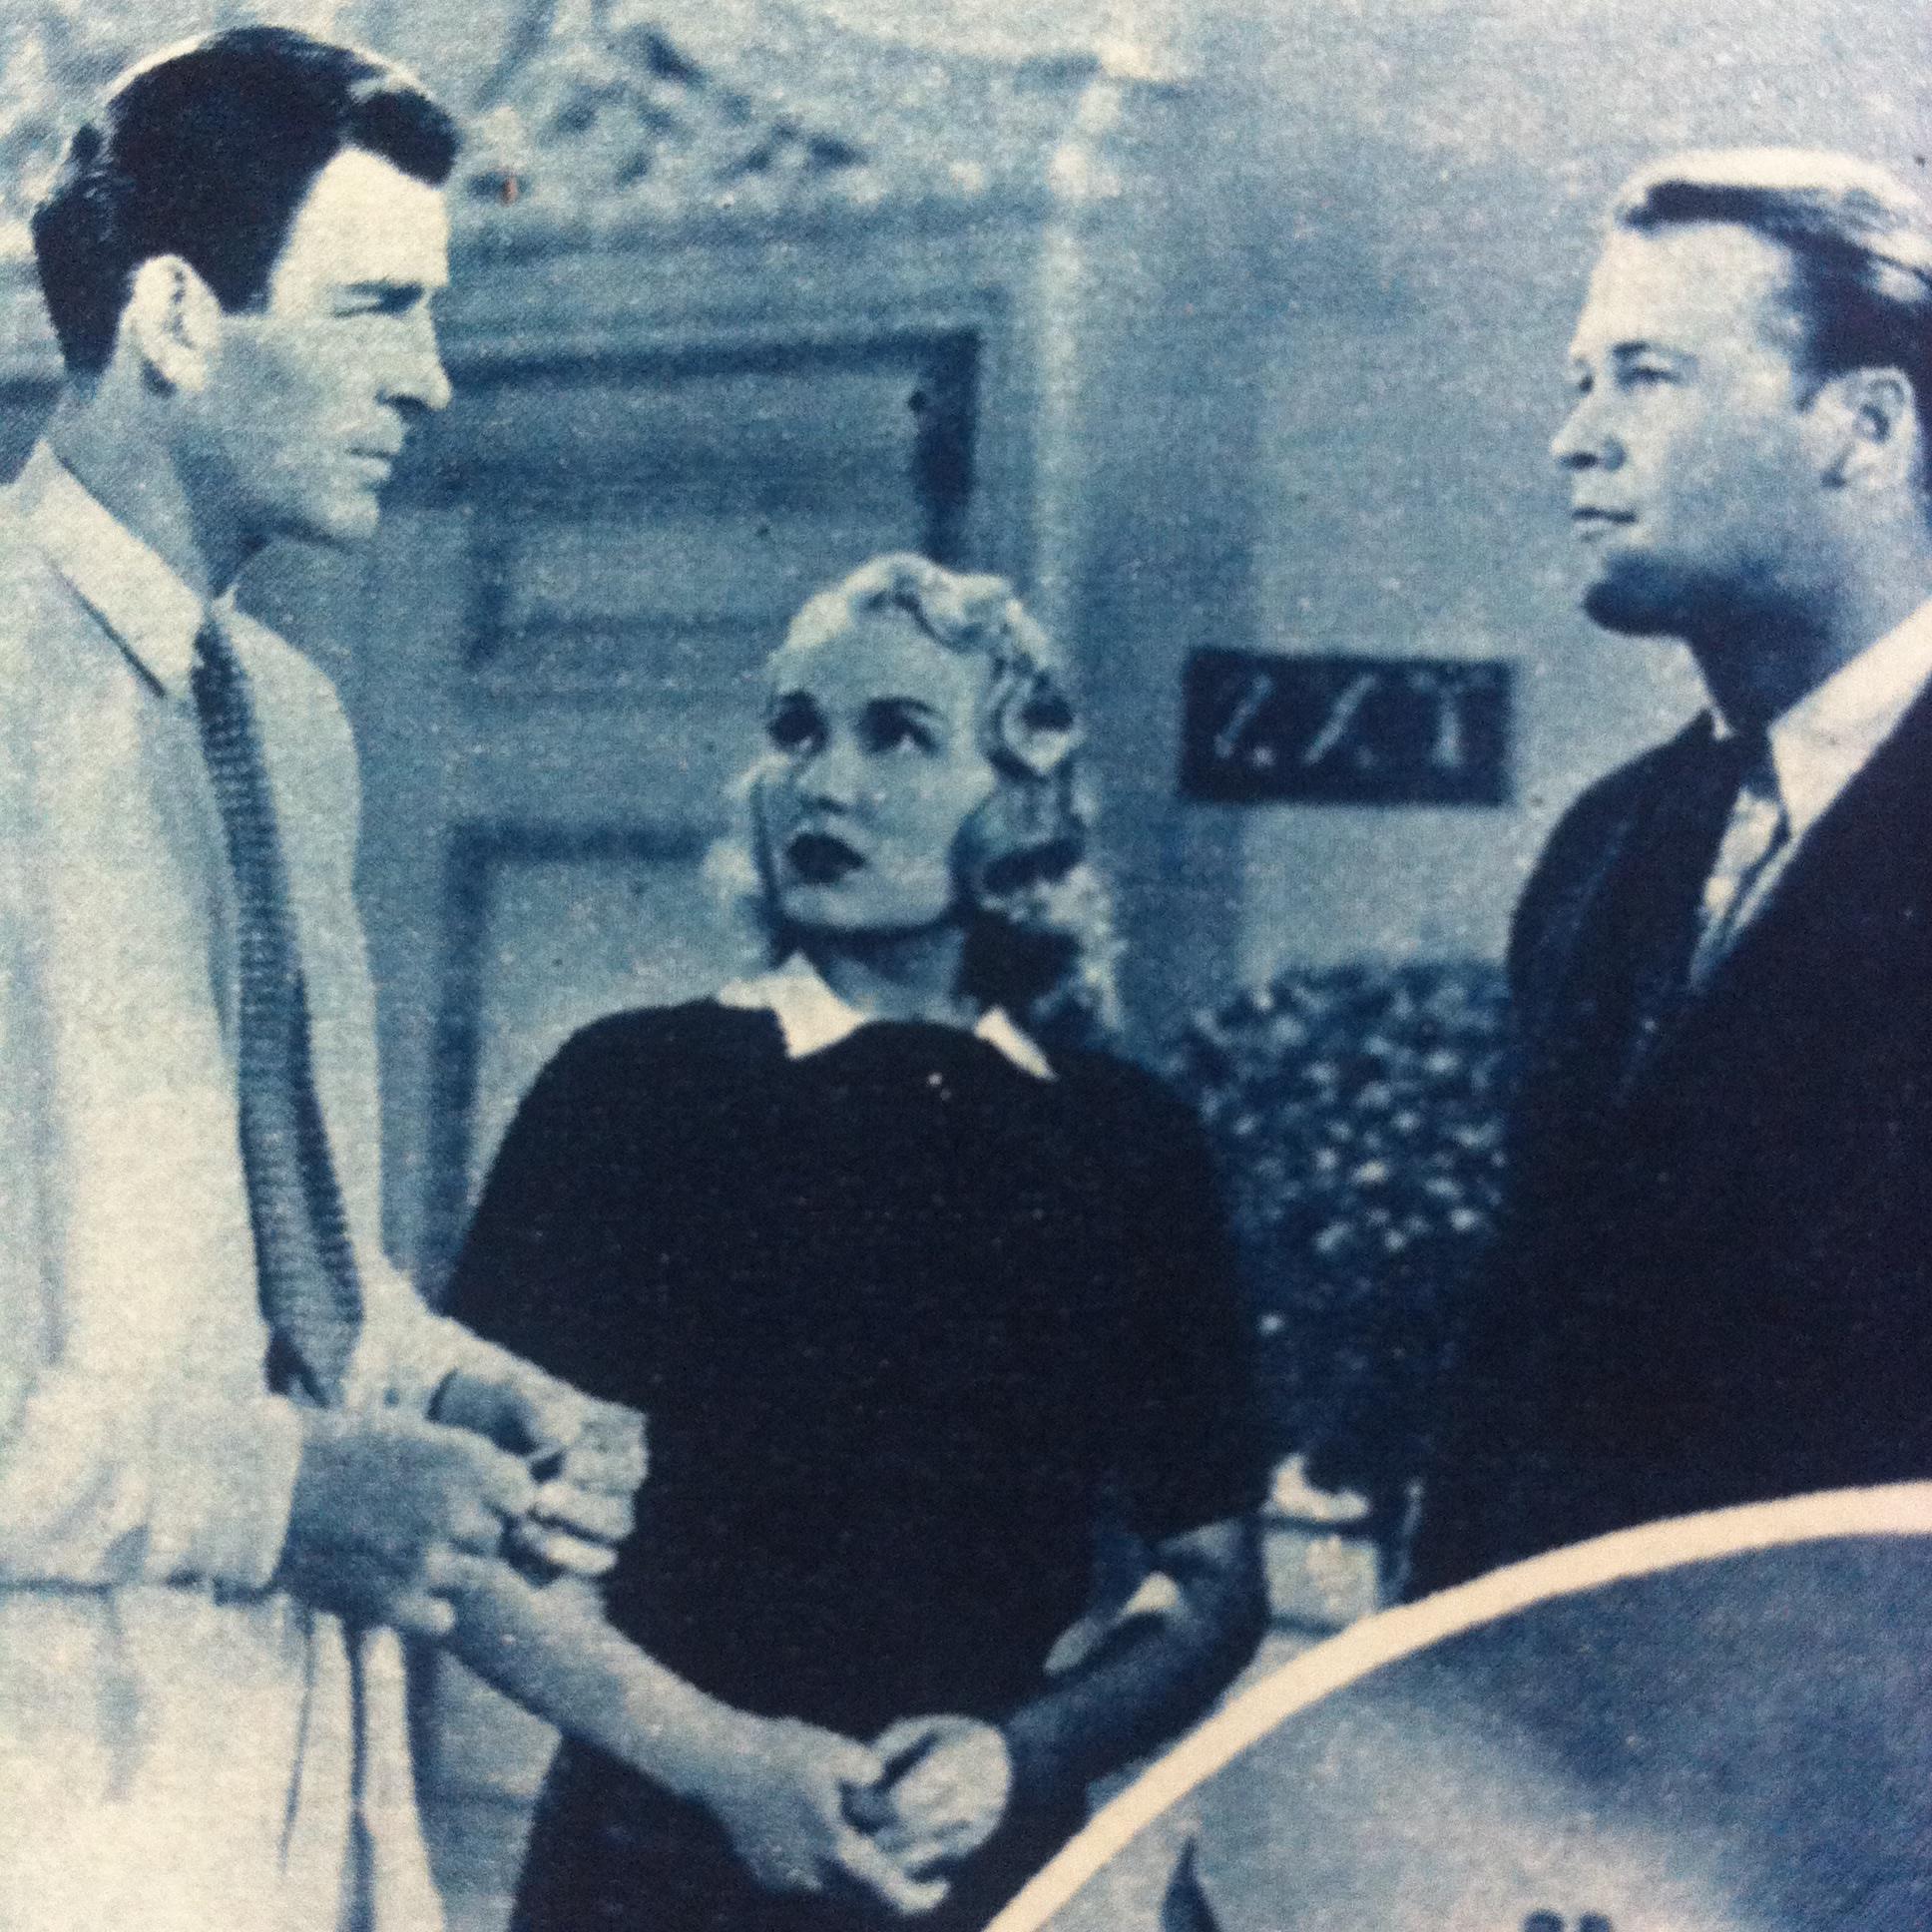 Rod Cameron, Virginia Dale, and Wayne Morris in The Quarterback (1940)